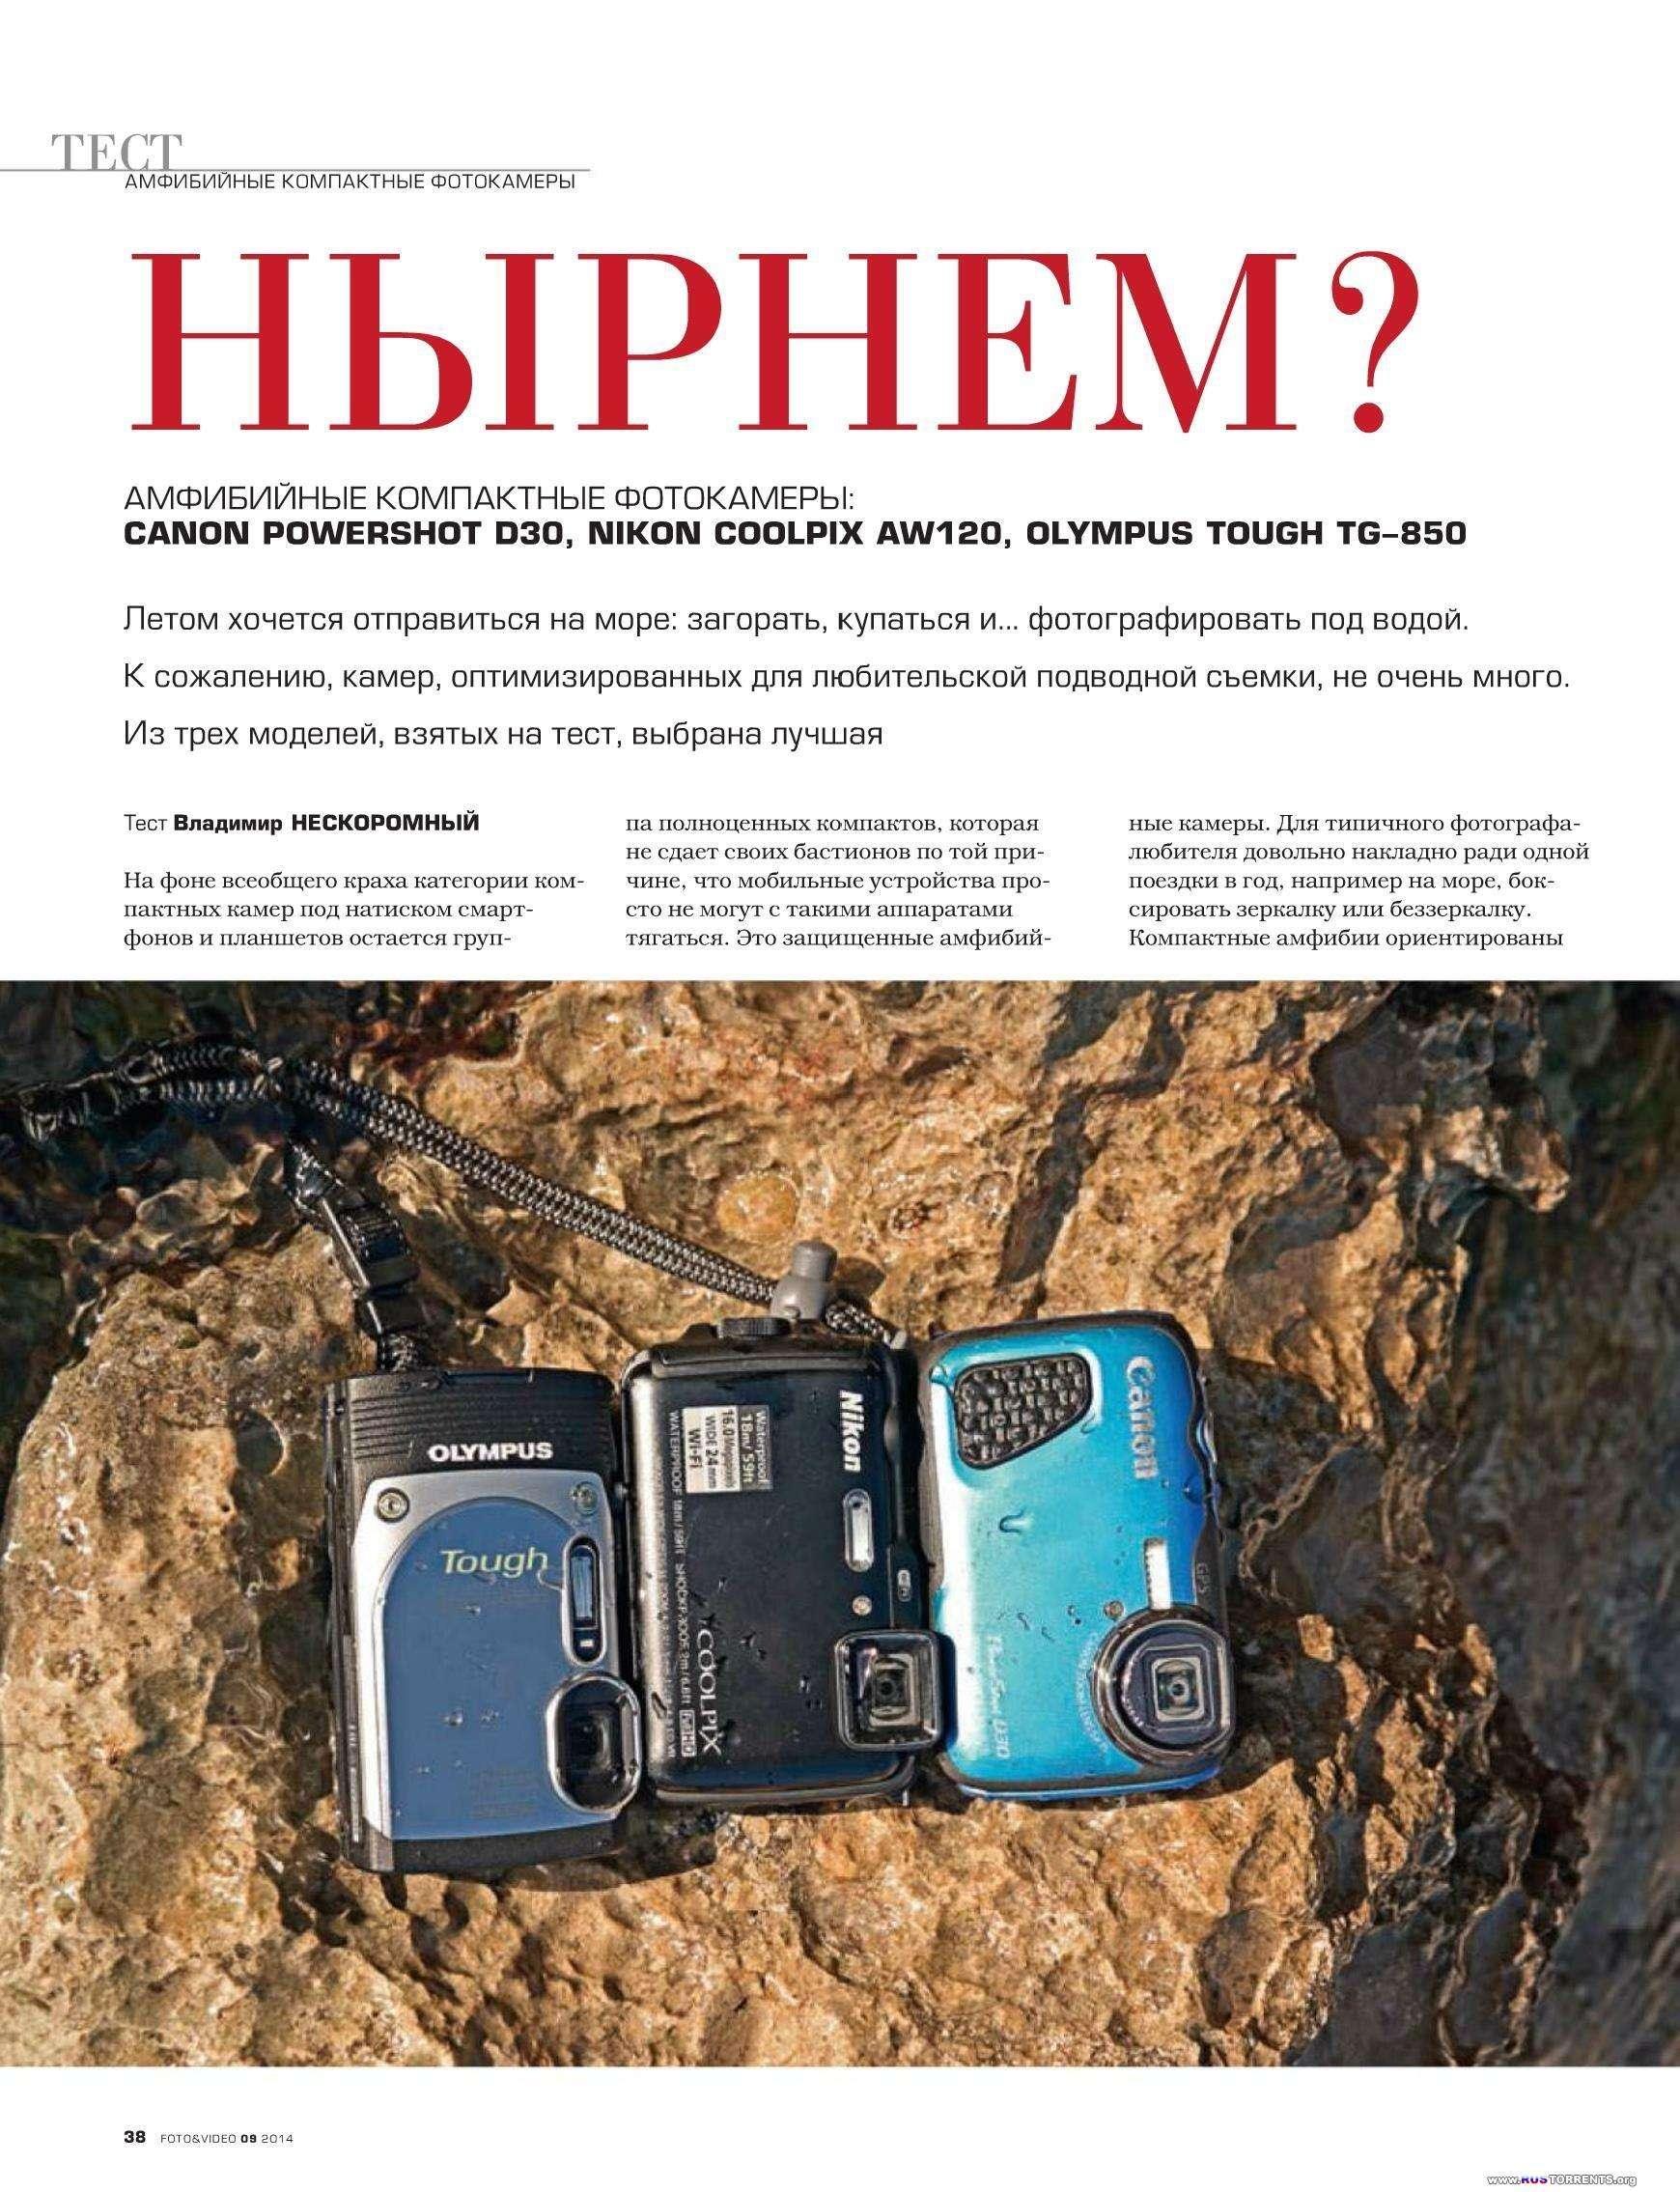 Foto & Video №9 [Сентябрь 2014] | PDF